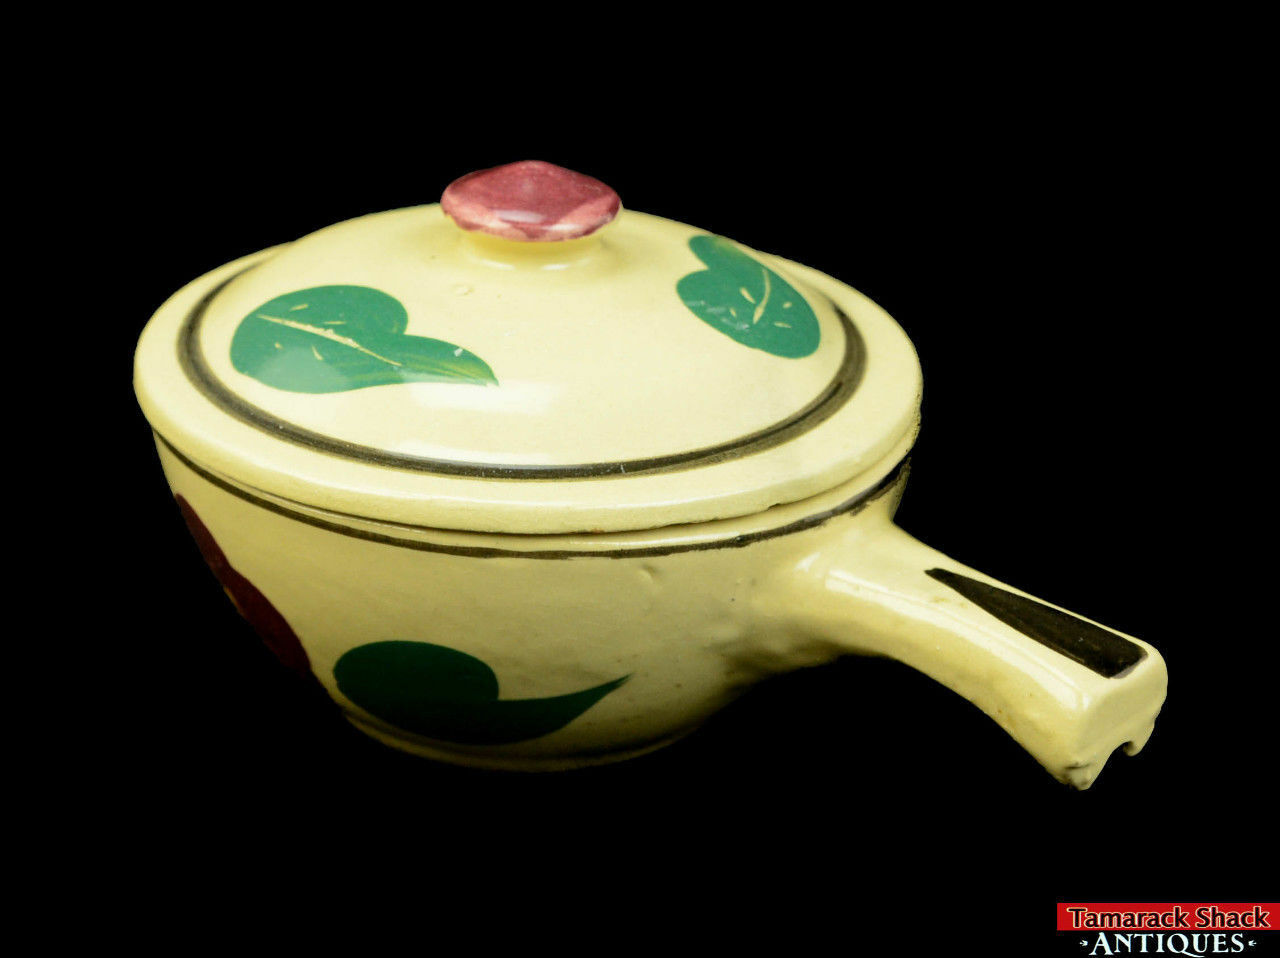 Watt-Pottery-Yellow-Ware-Individual-Covered-Stick-Casserole-Lid-Rio-Rose-VTG-L5Y-361680190681-5.jpg